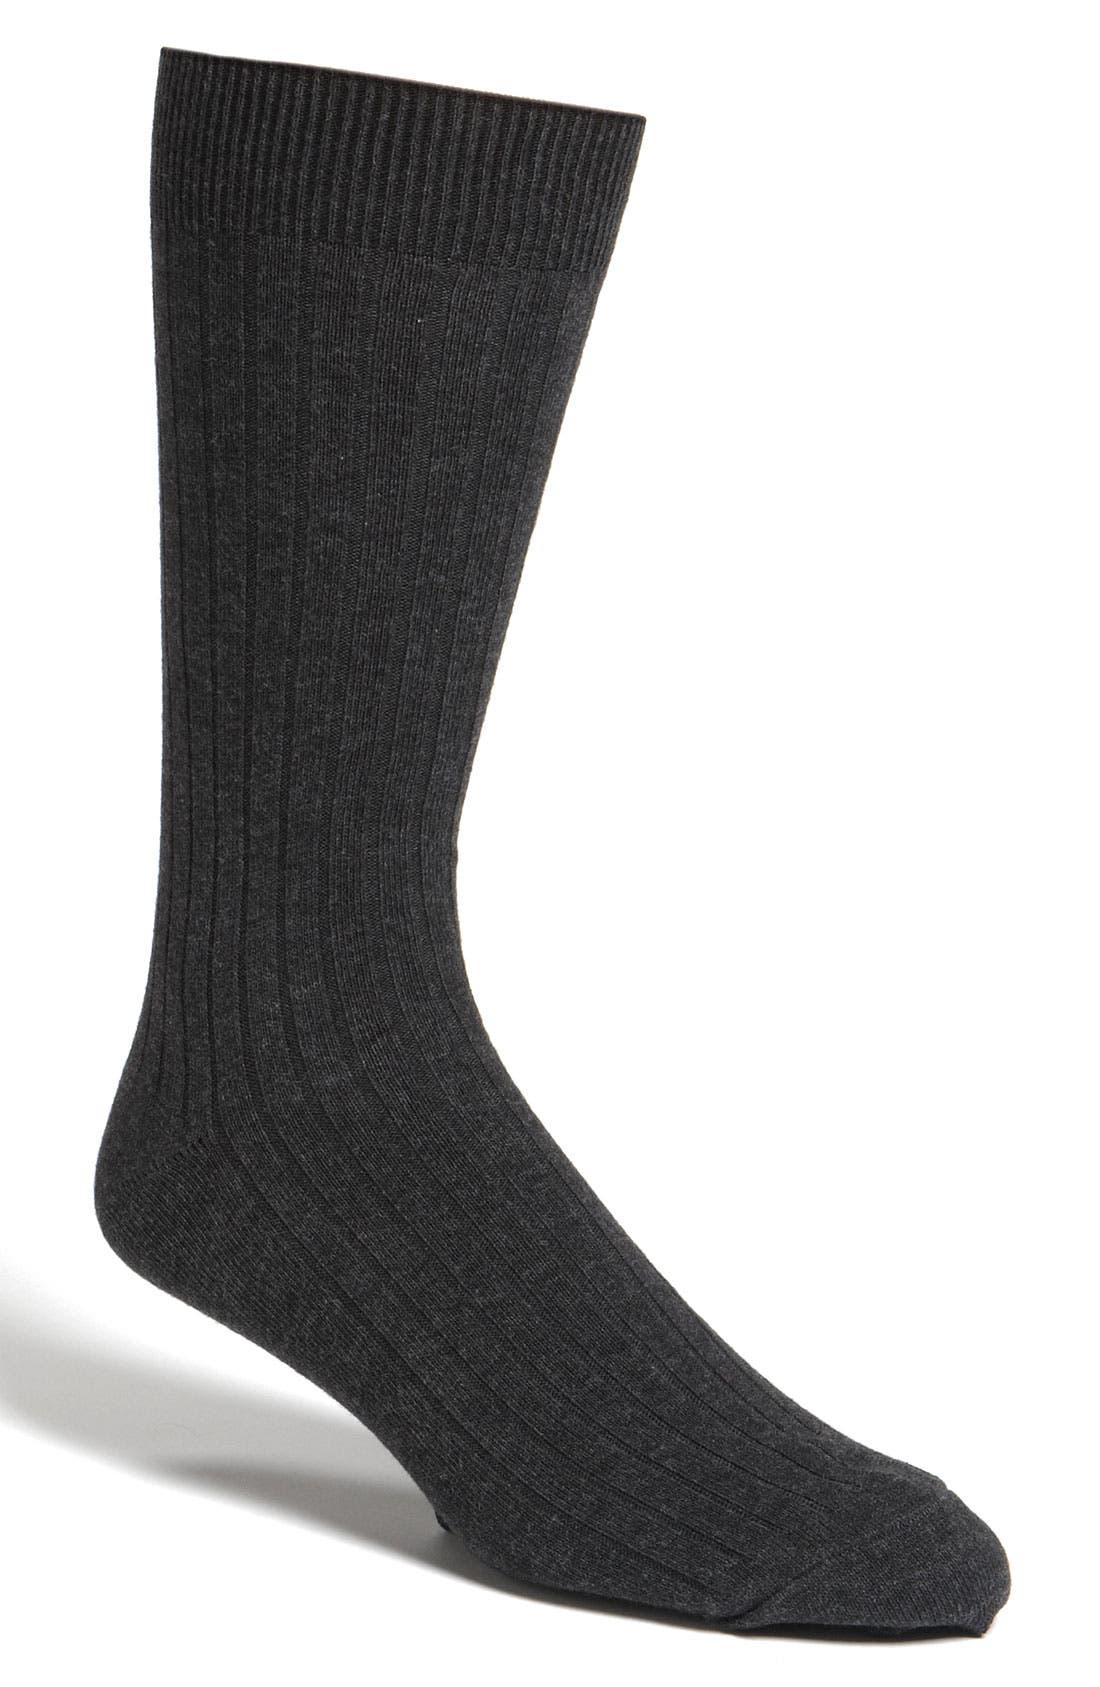 NORDSTROM MEN'S SHOP, Cotton Blend Socks, Main thumbnail 1, color, BLACK HEATHER